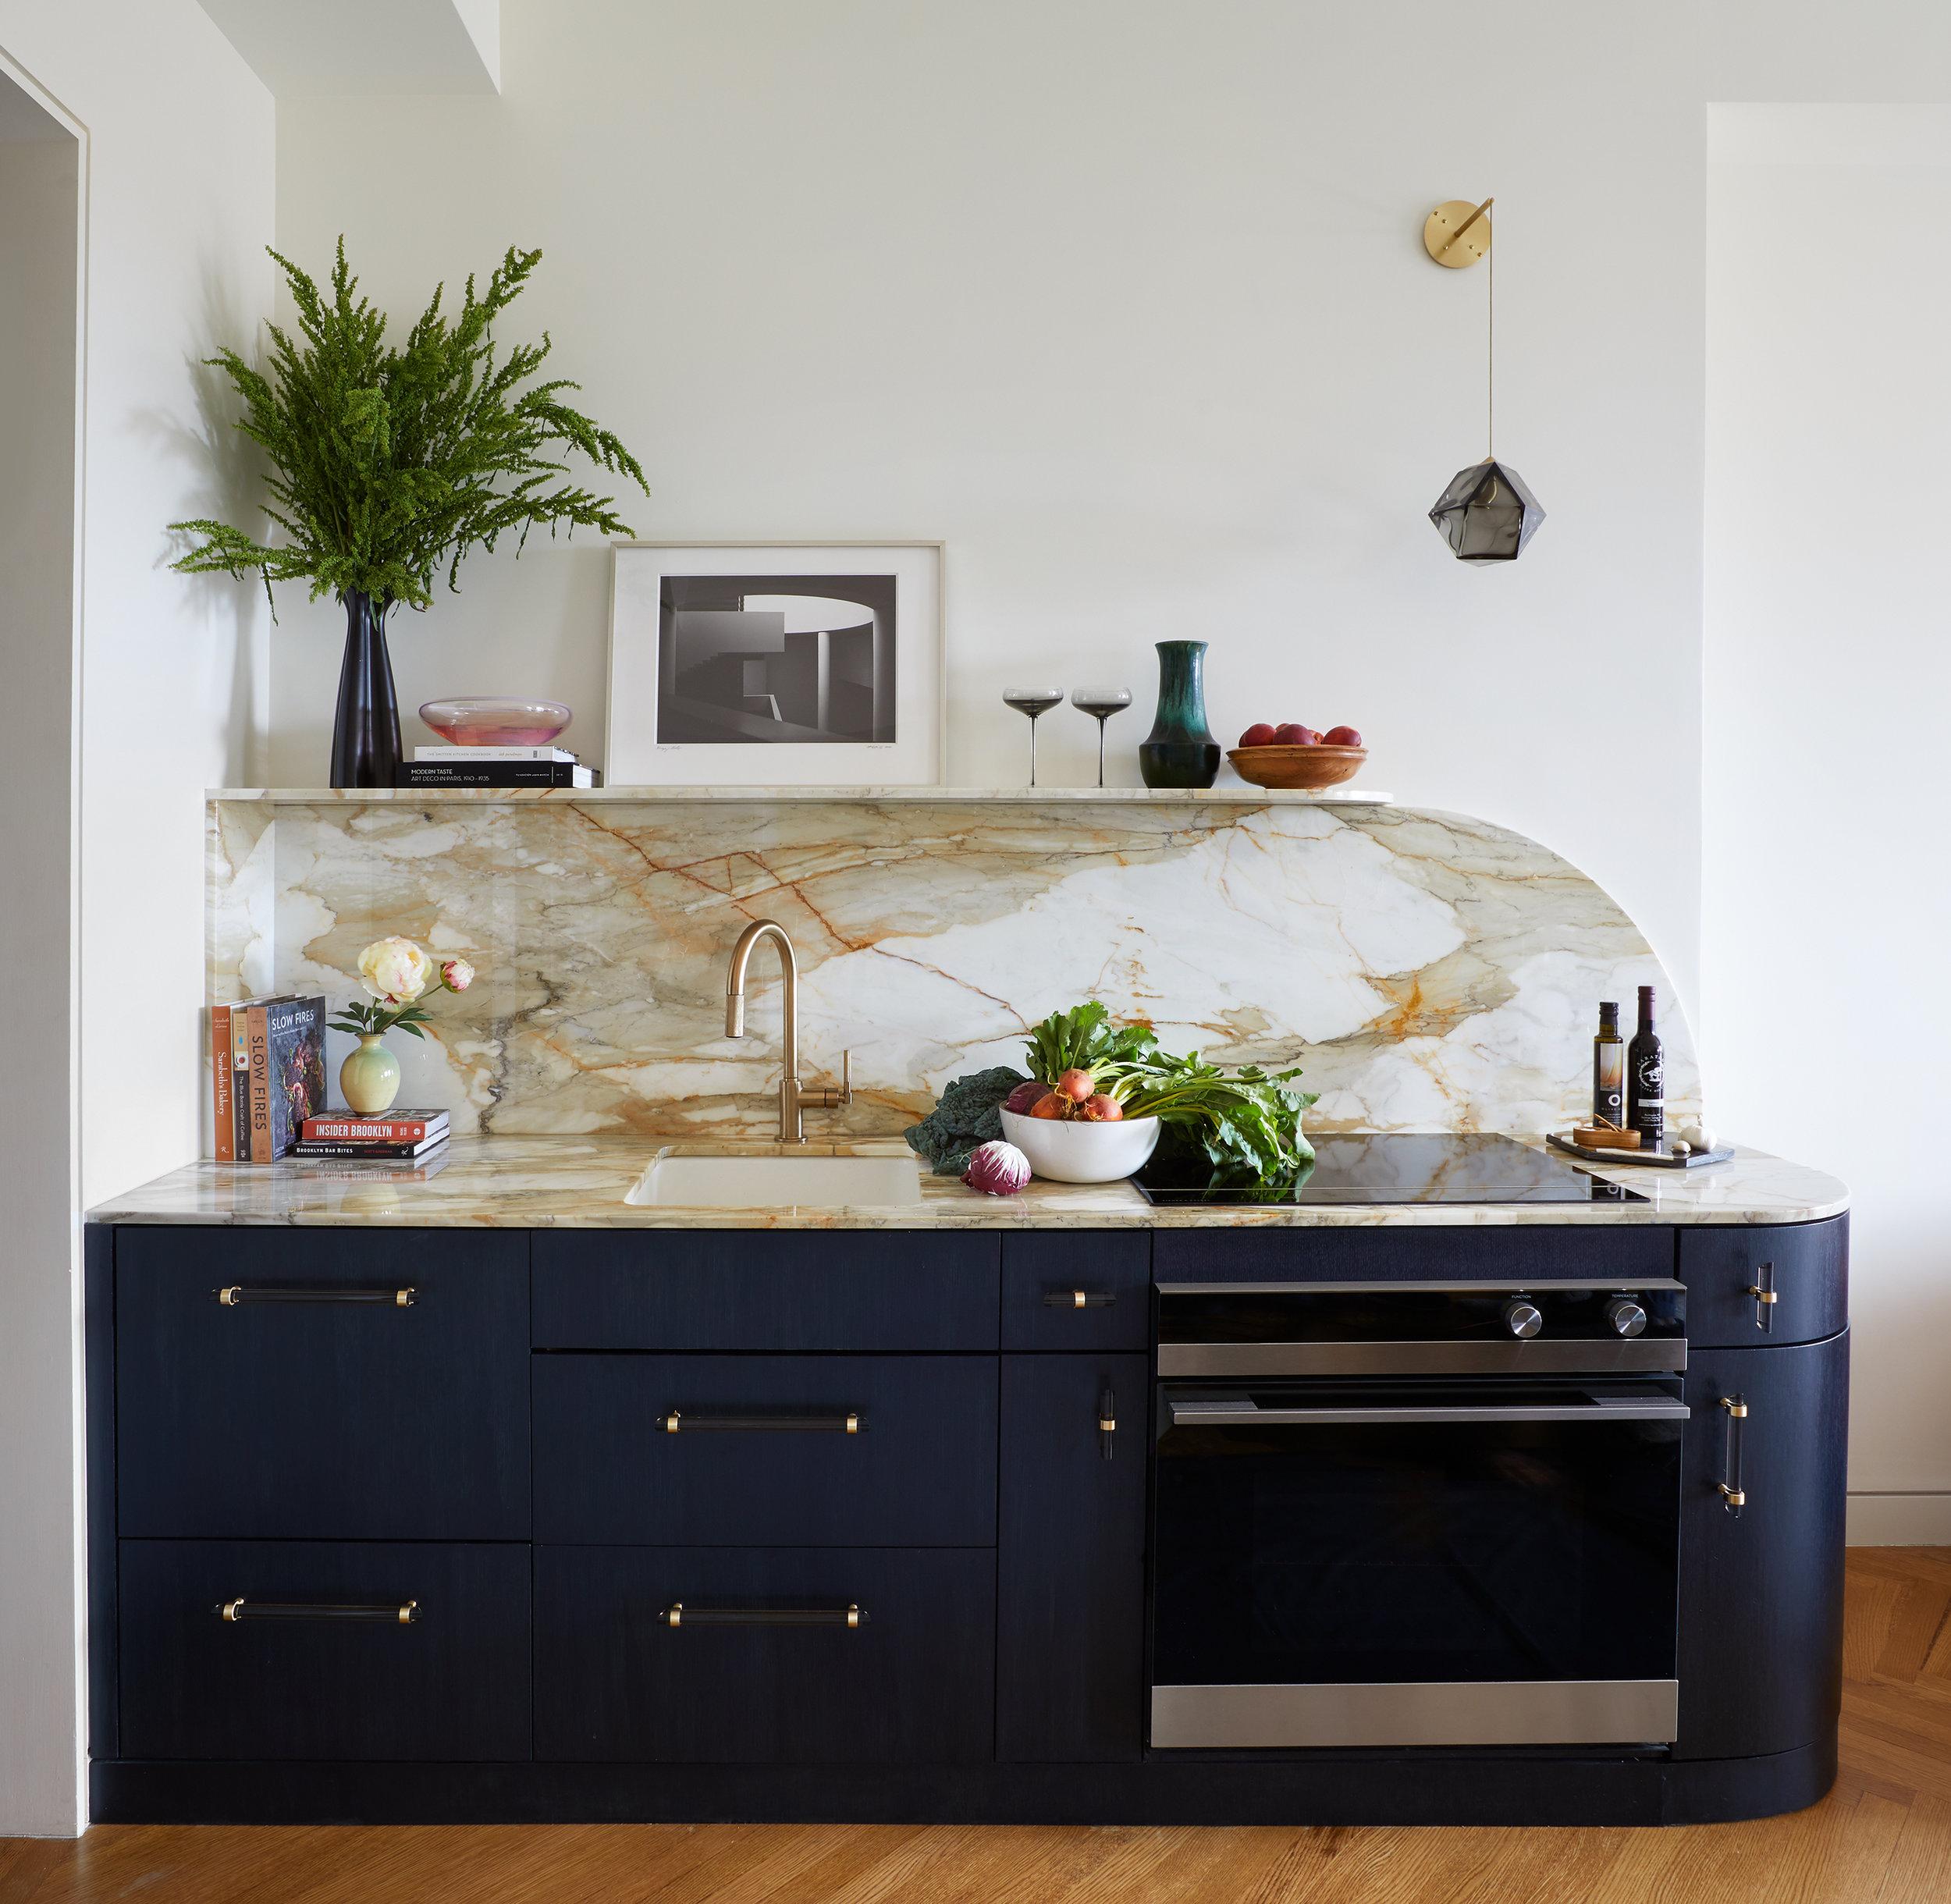 140-brooklyn-art-deco-duplex-kitchenette